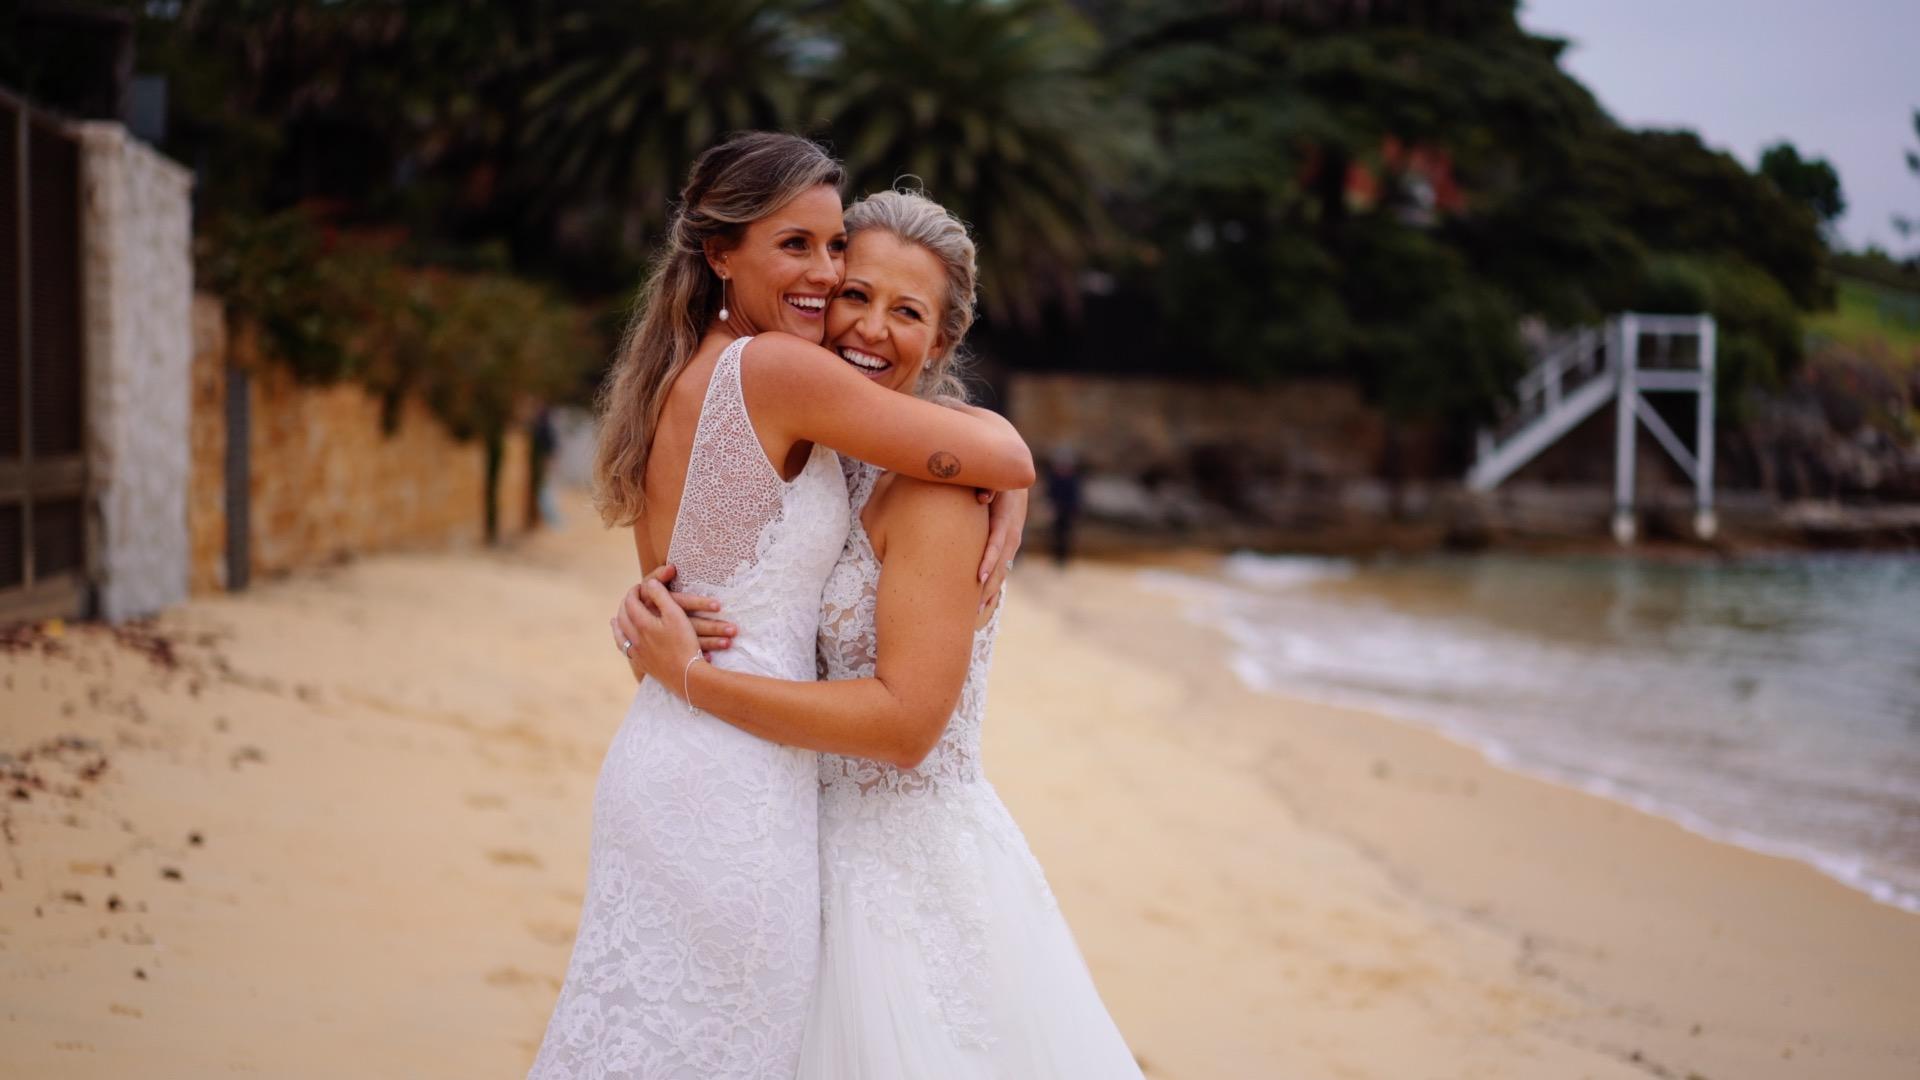 Melissa + Michaela | Watsons Bay, Australia | Green Point Reserve